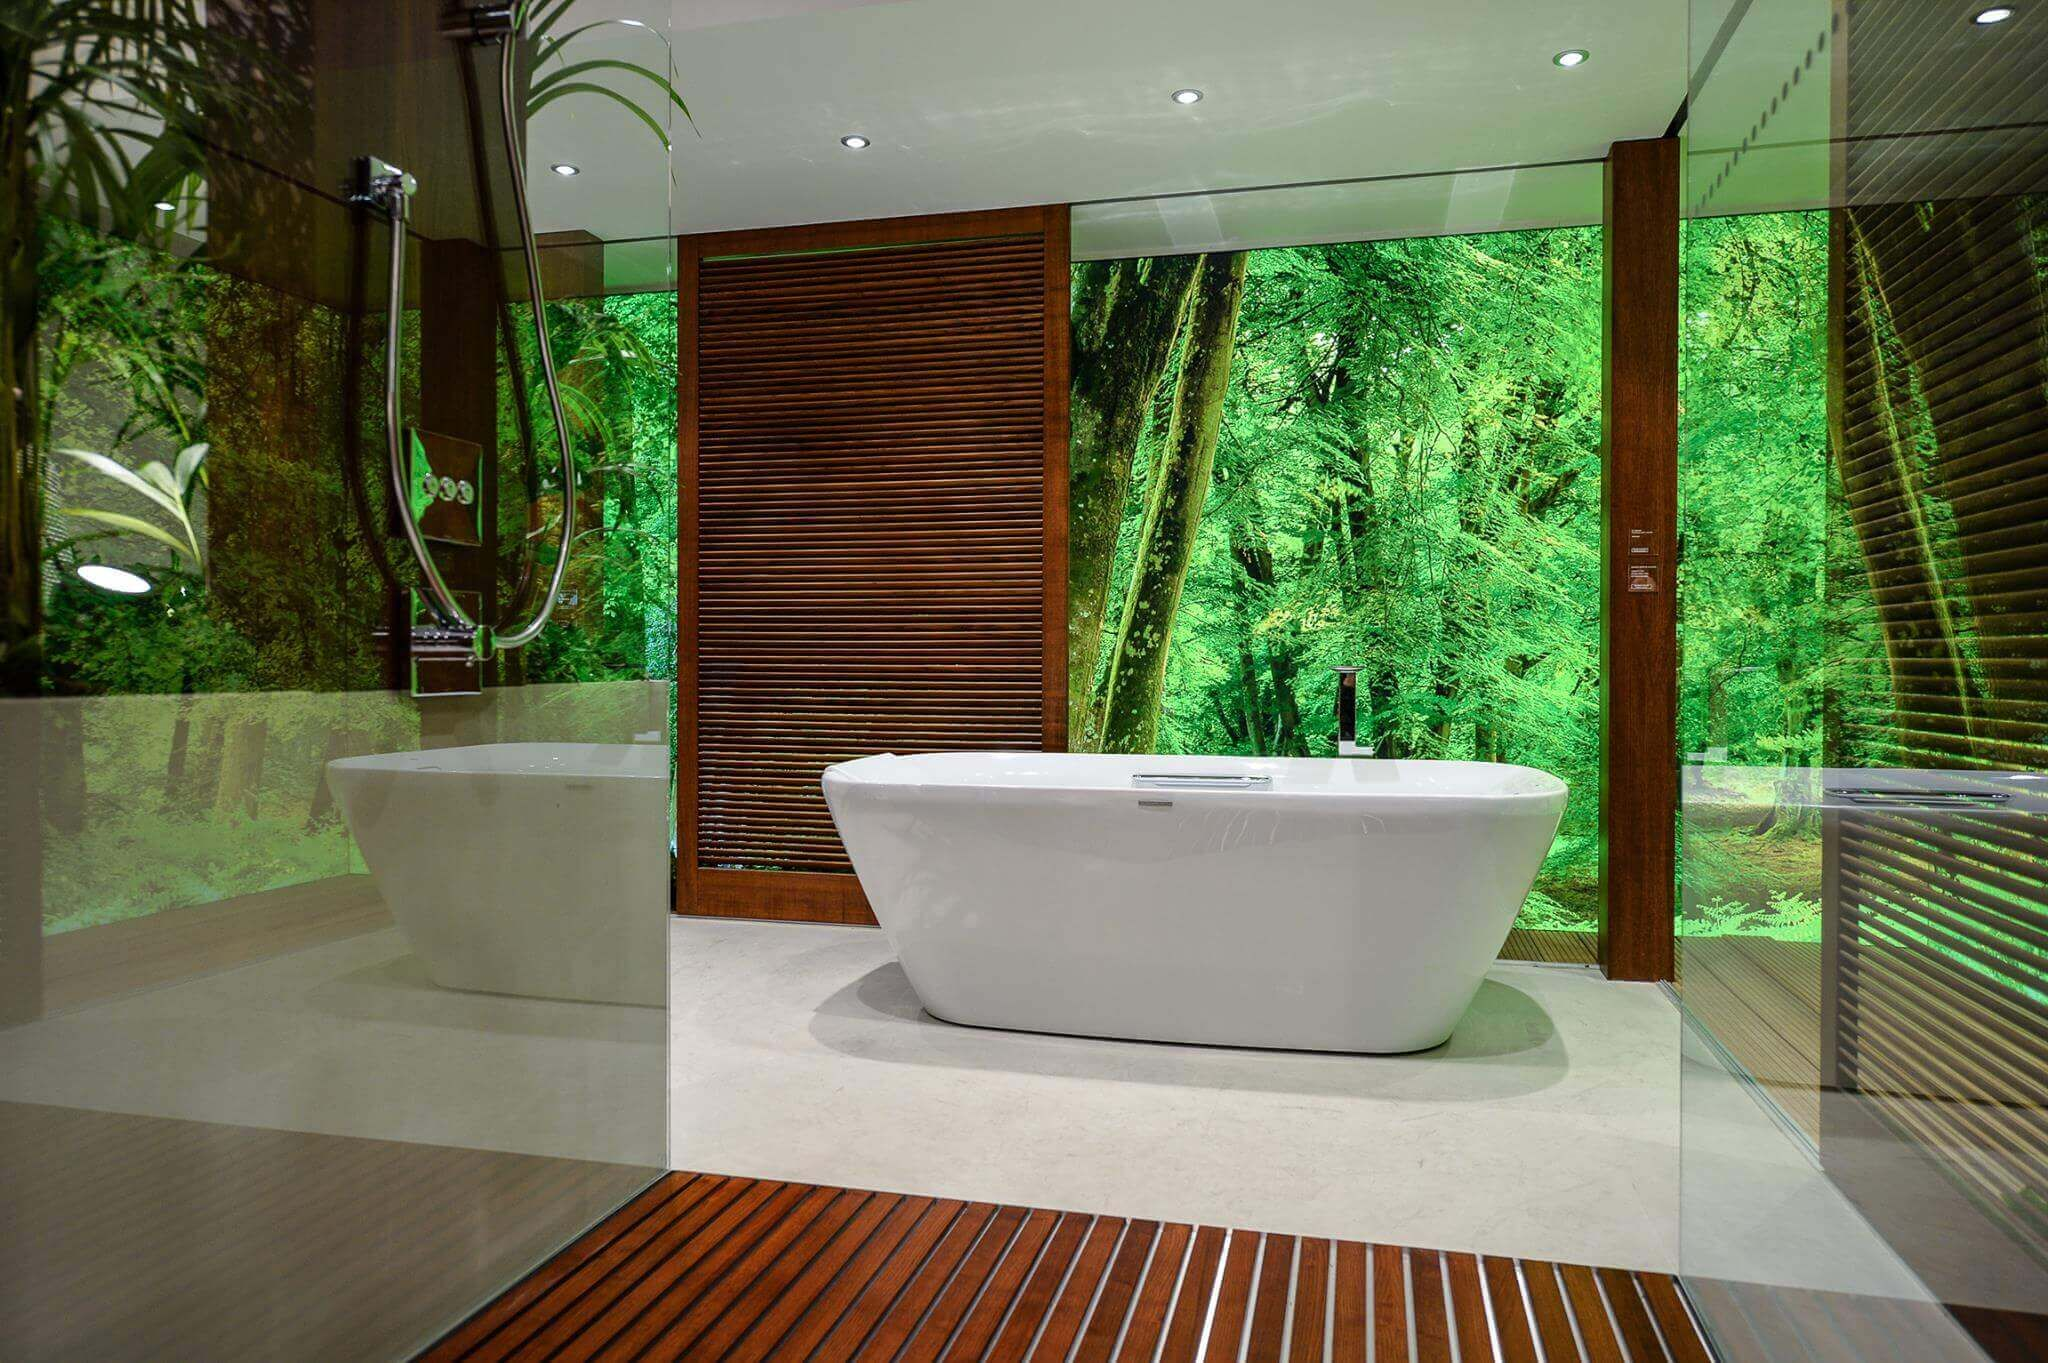 Badezimmer Interior Design With Images Bathroom Design Trends